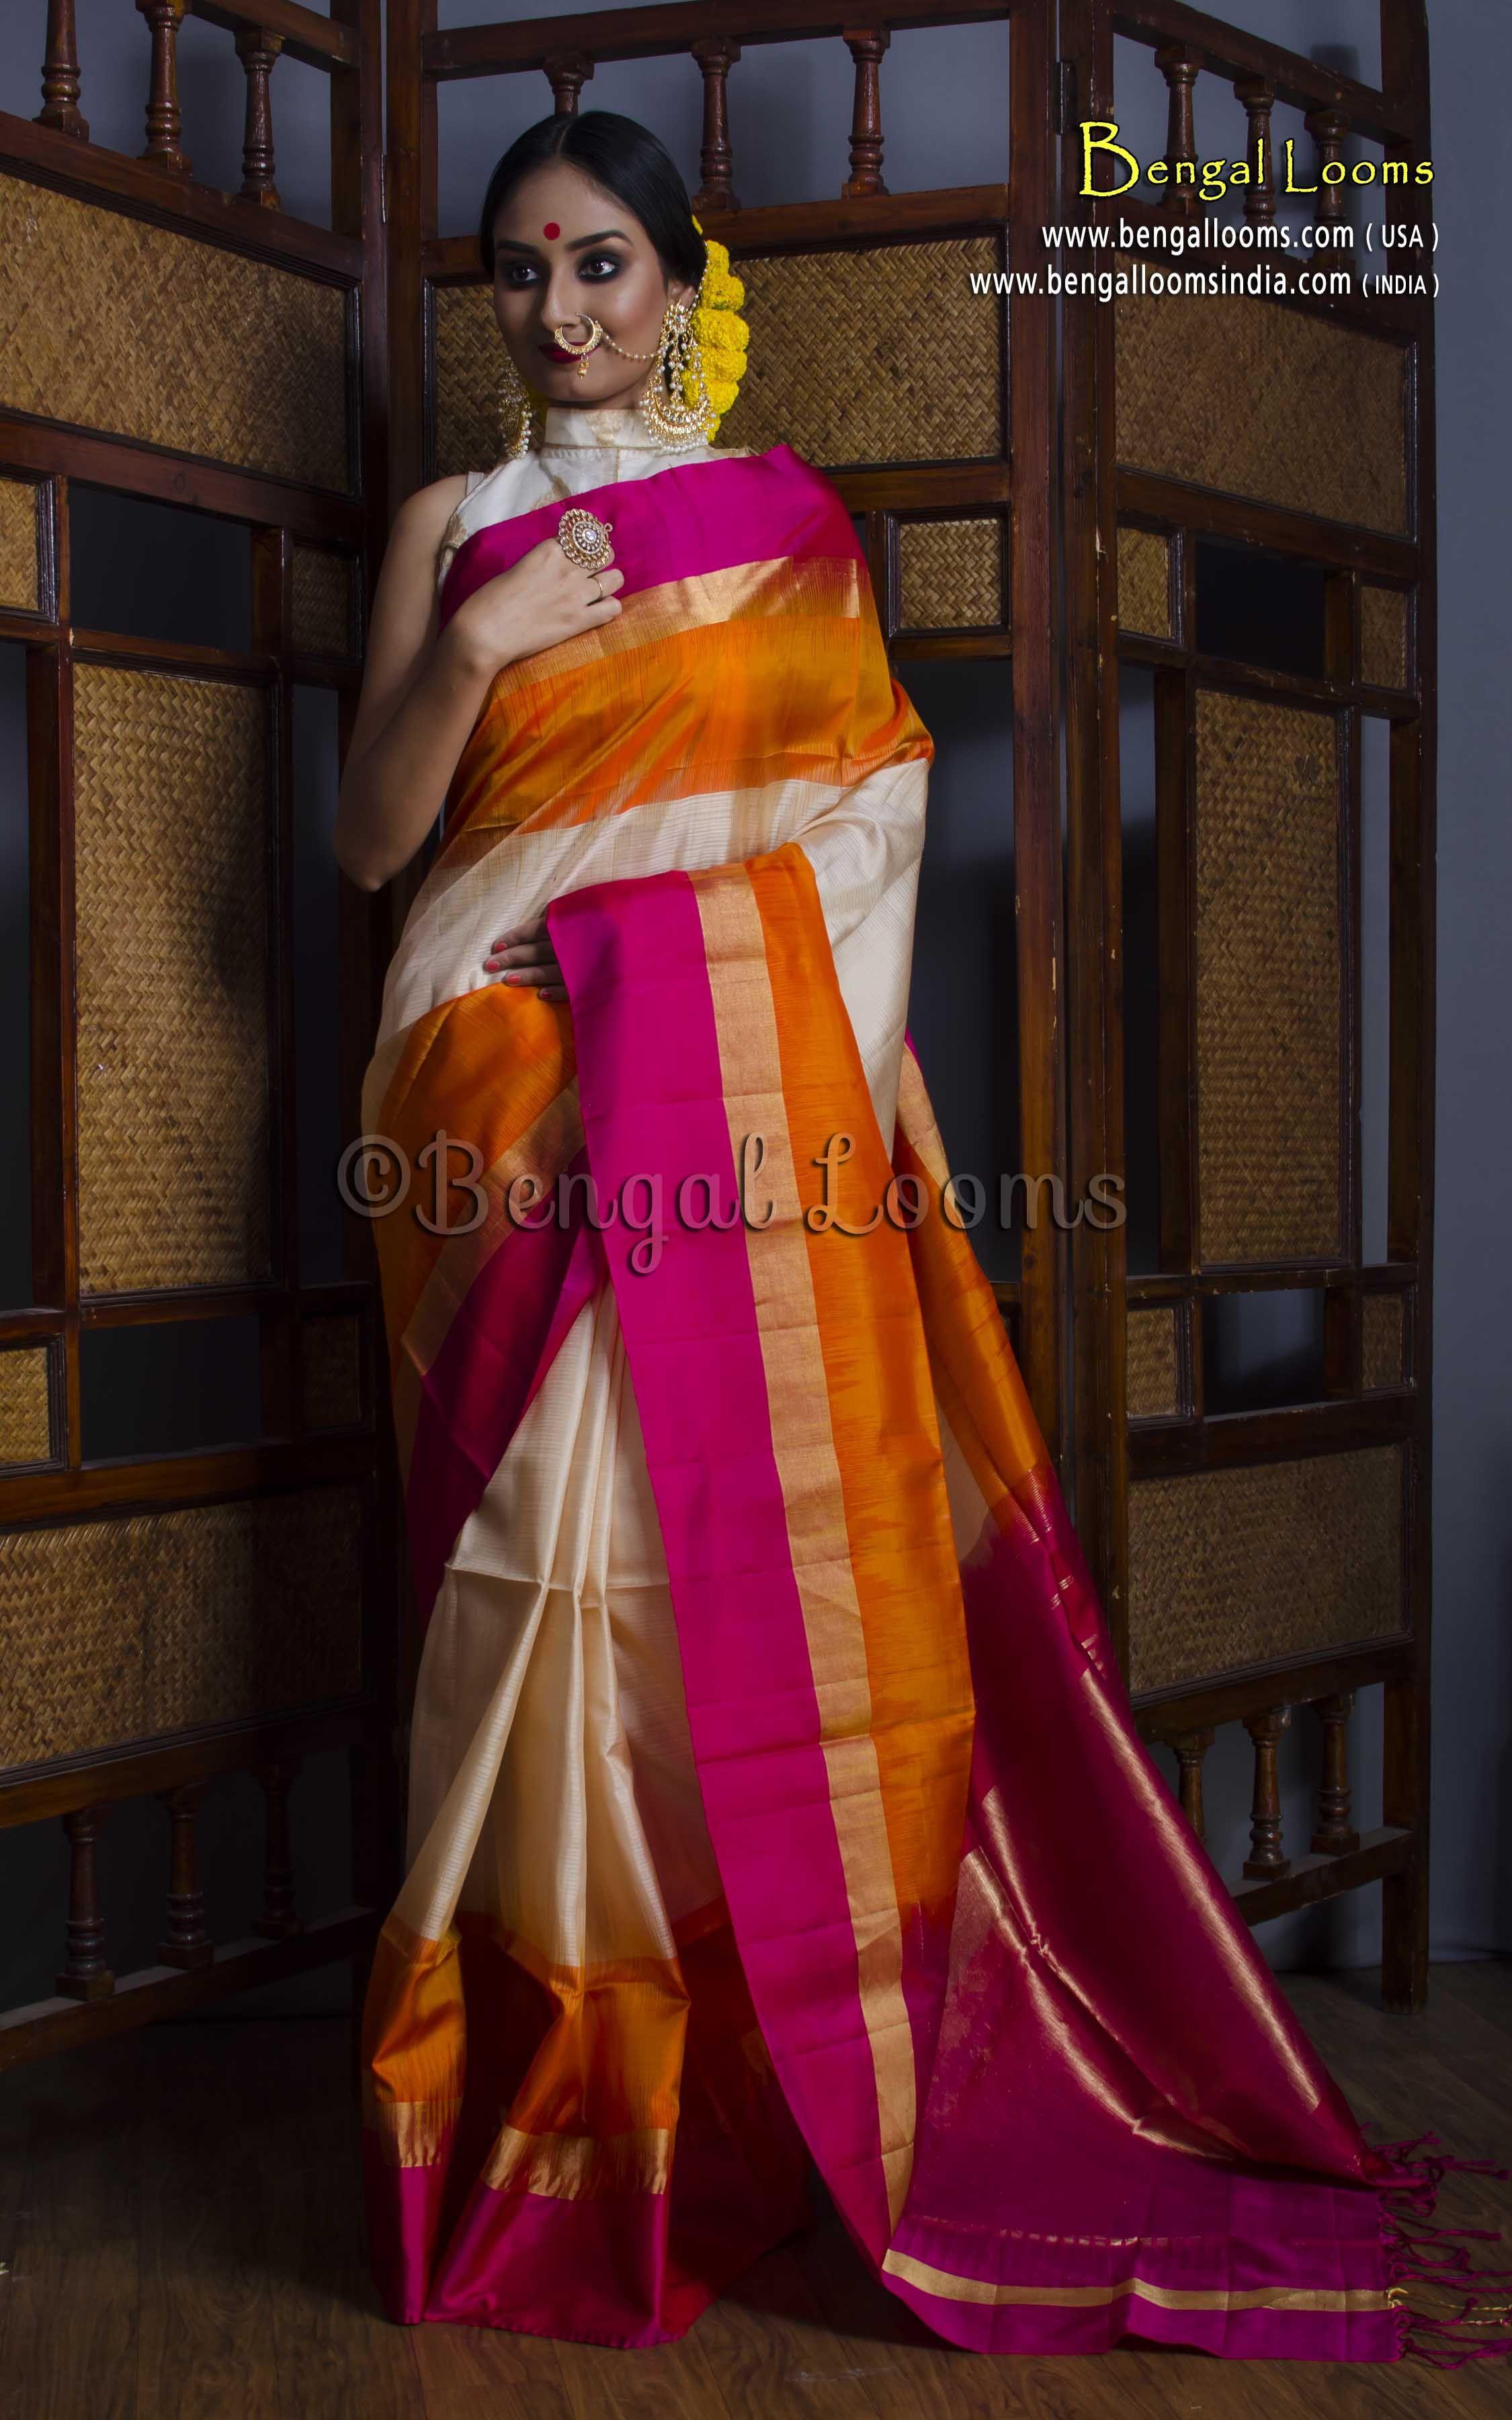 fe582bae6adb Pure Handloom Kanchipuram Soft Silk Saree in Cream